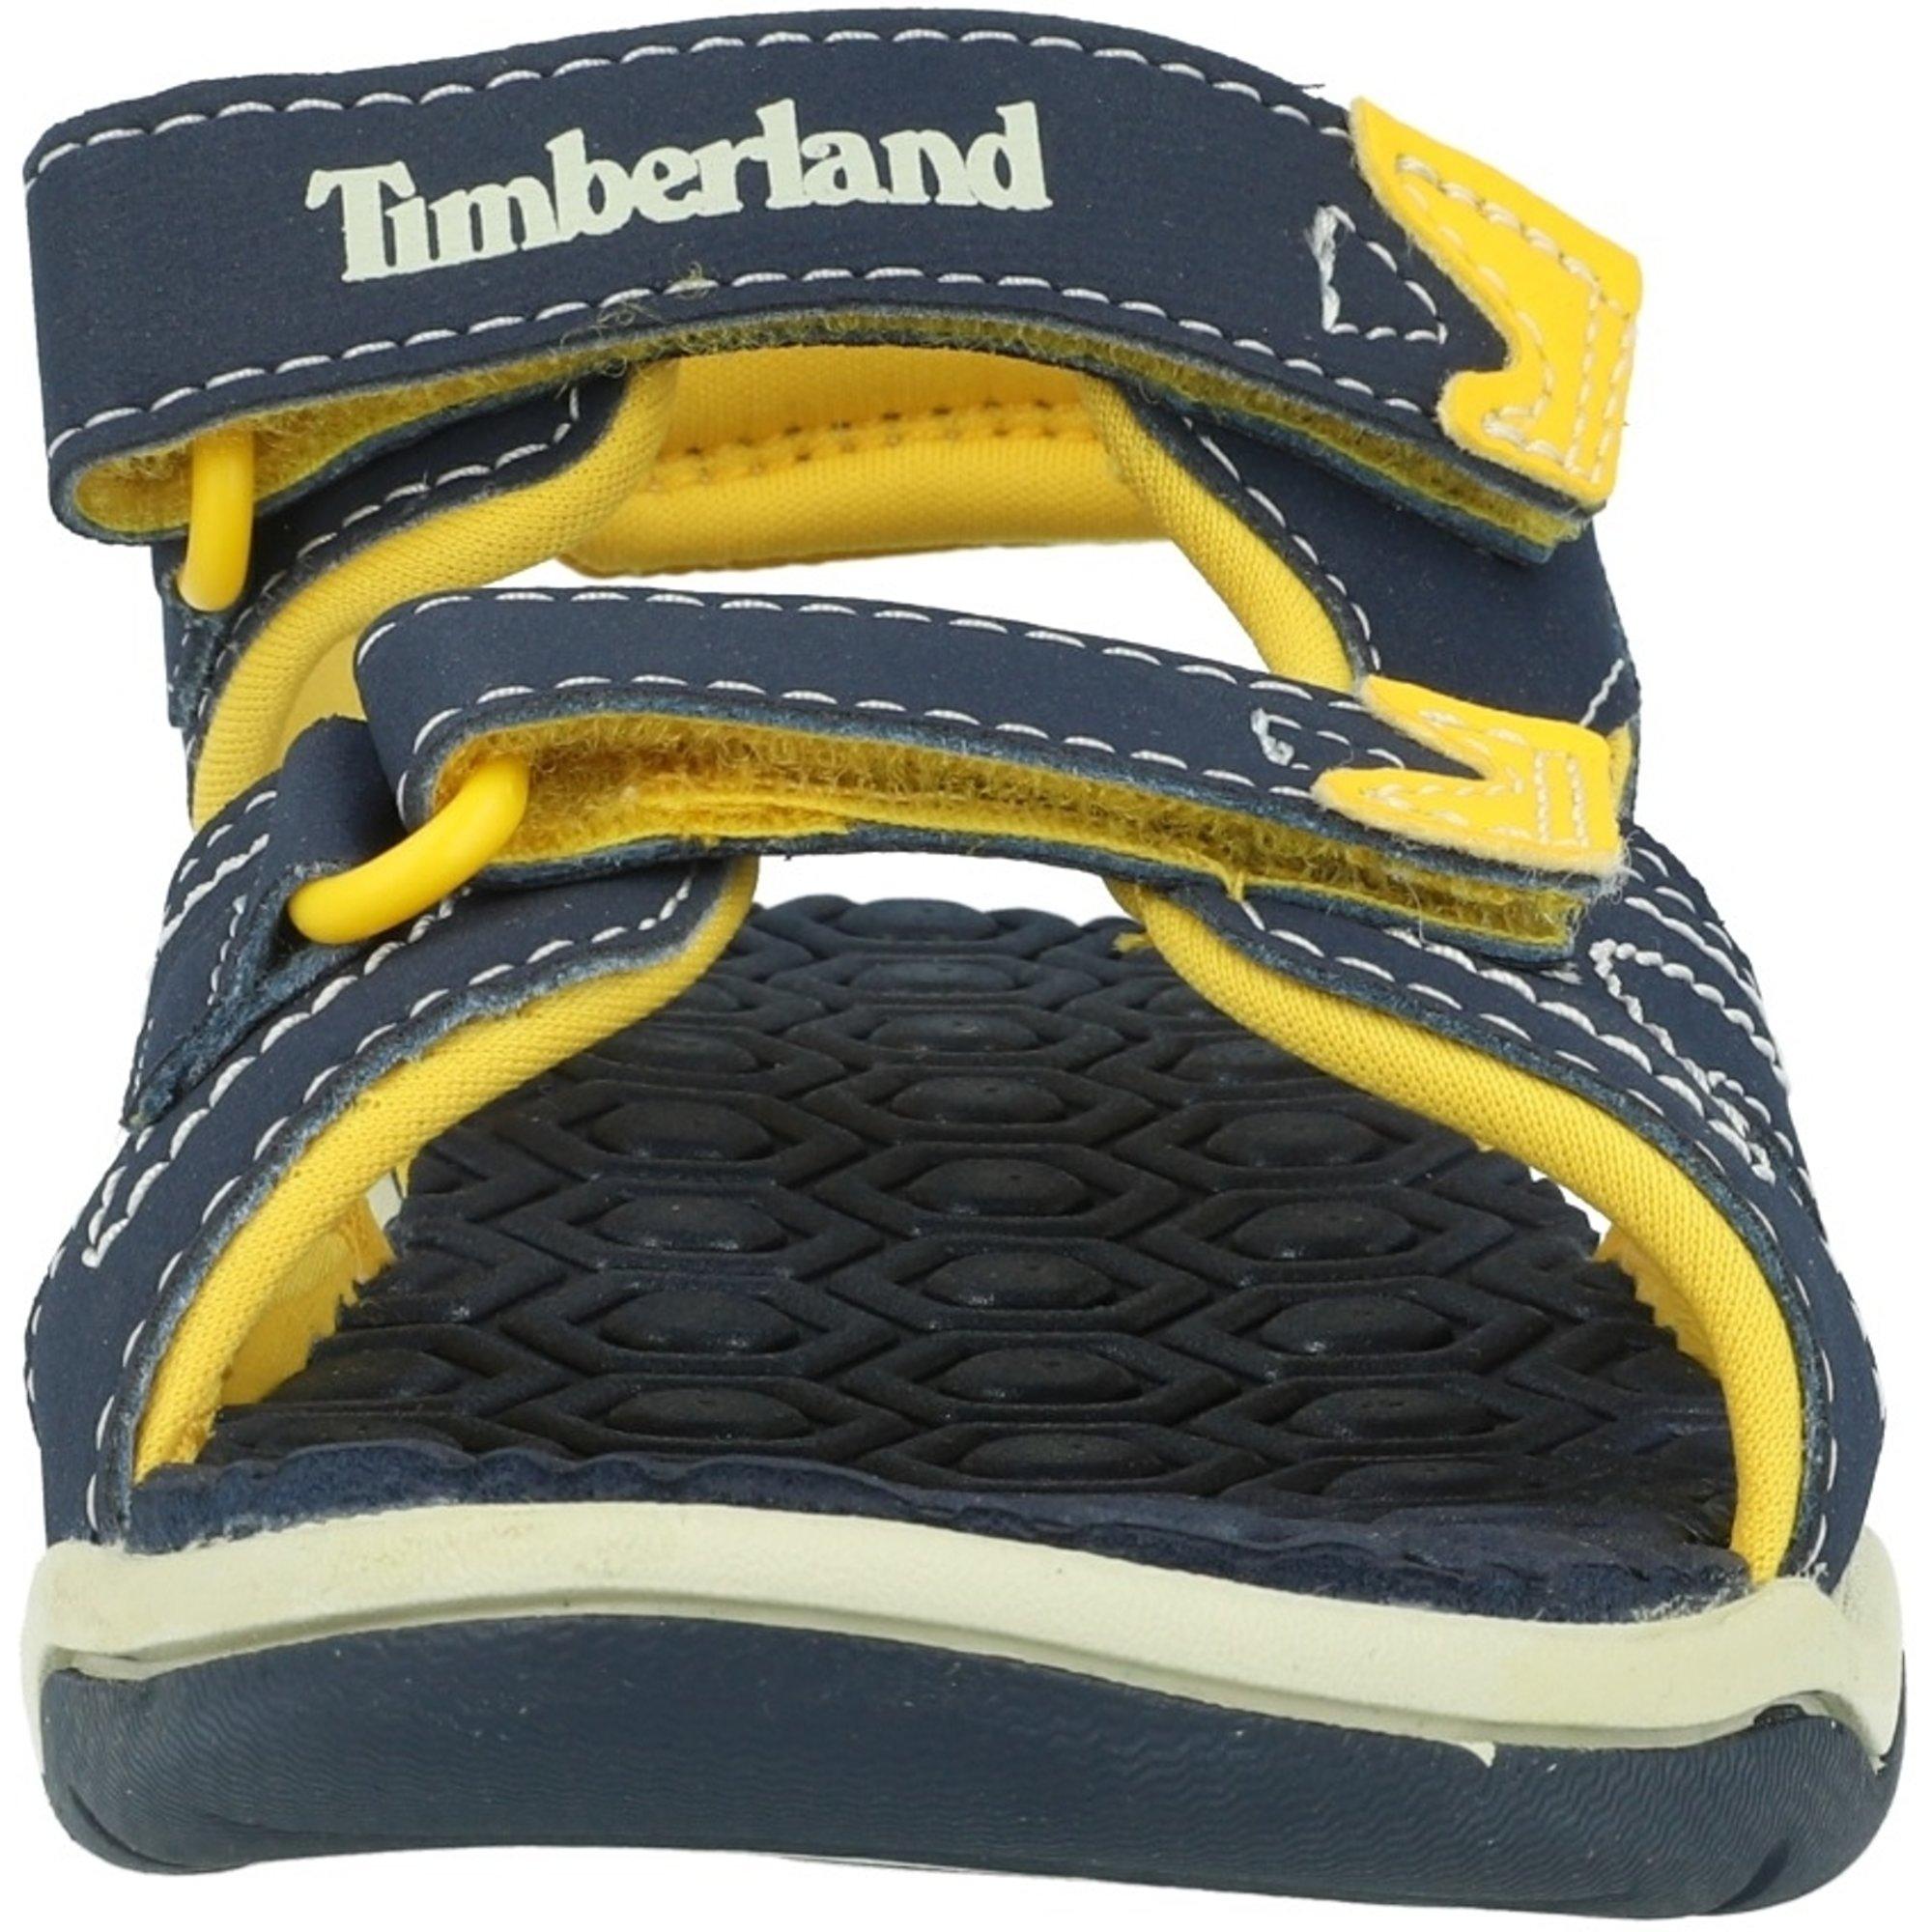 Timberland Adventure Seeker Y Navy Synthetic